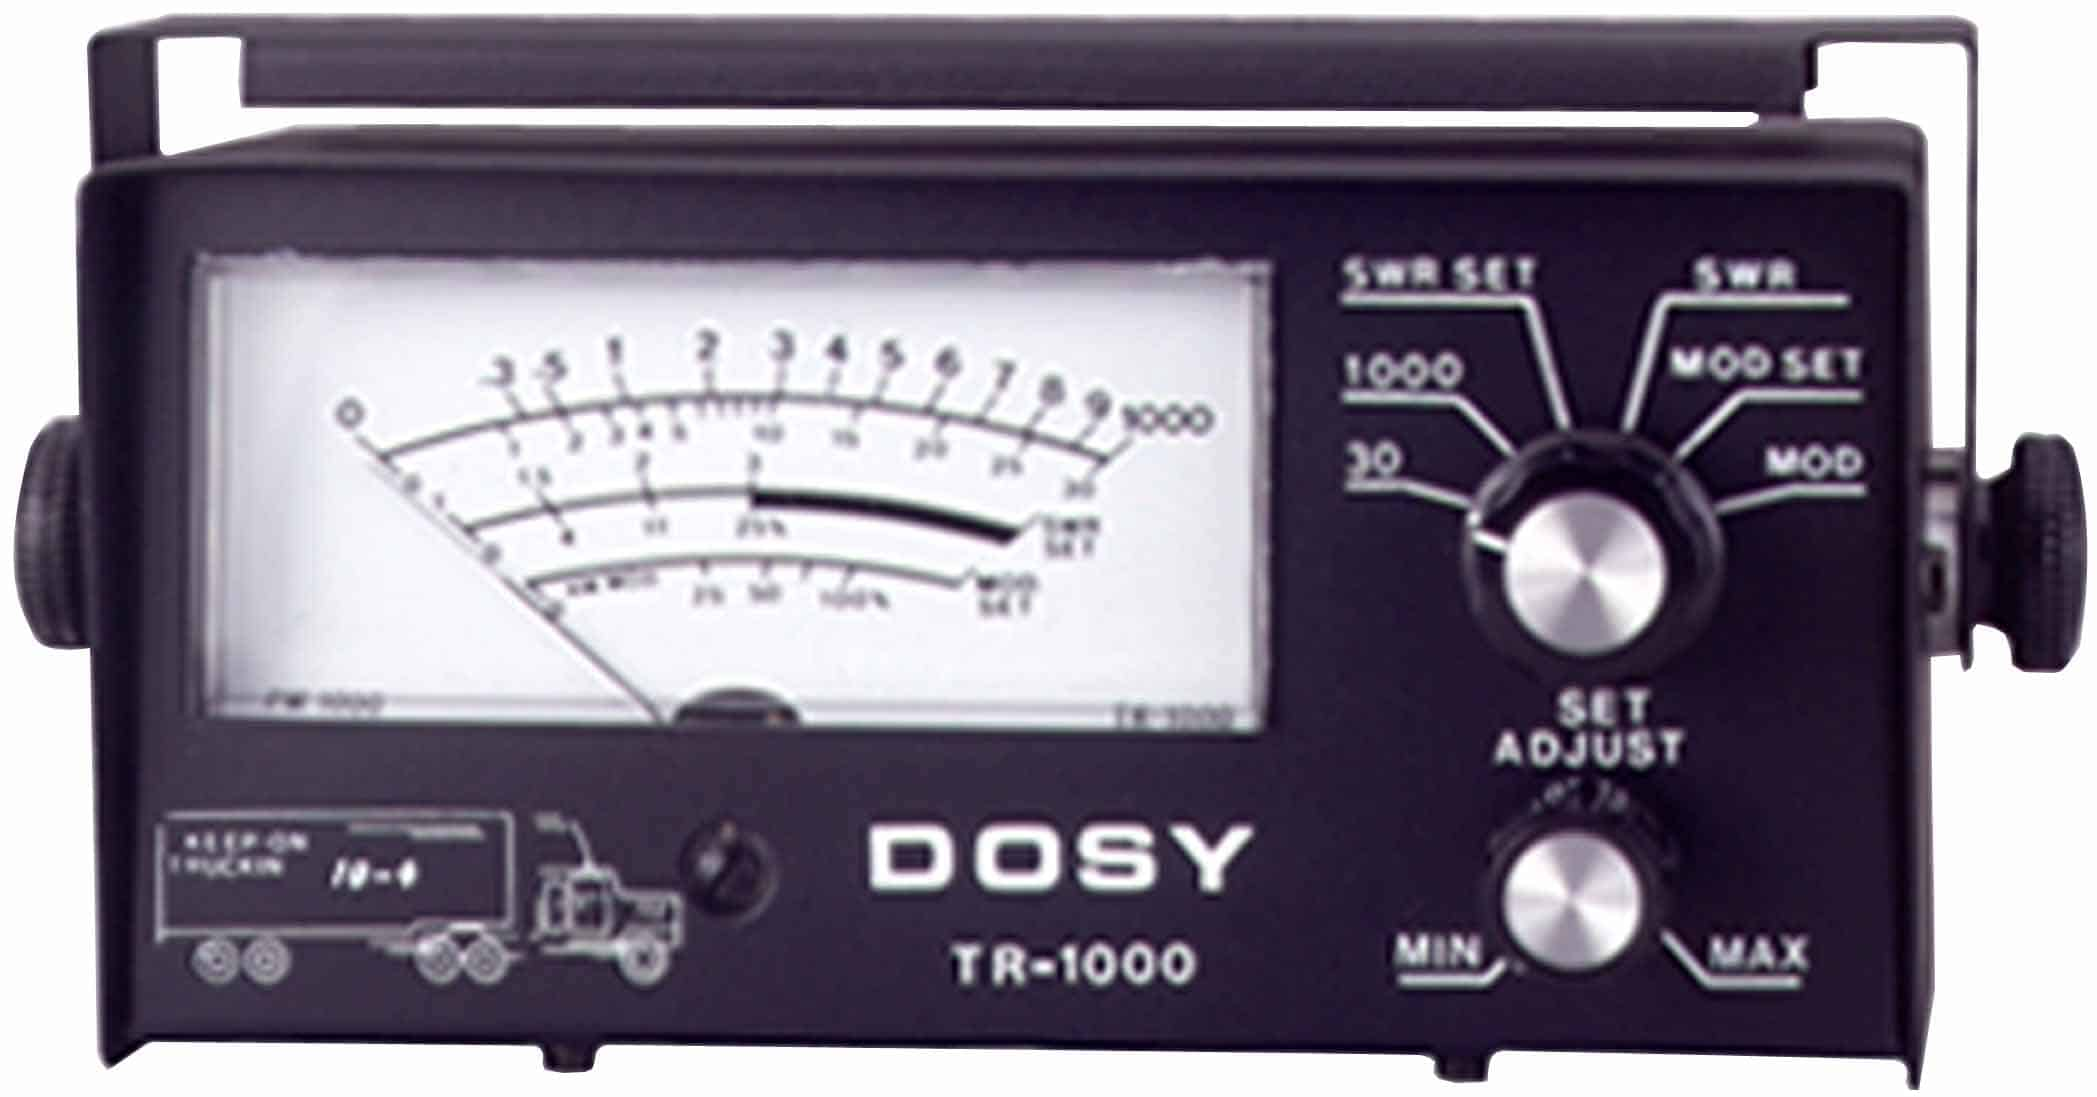 TR1000 - Dosy 1000 Watt In Line Mobile Swr/Watt Meter